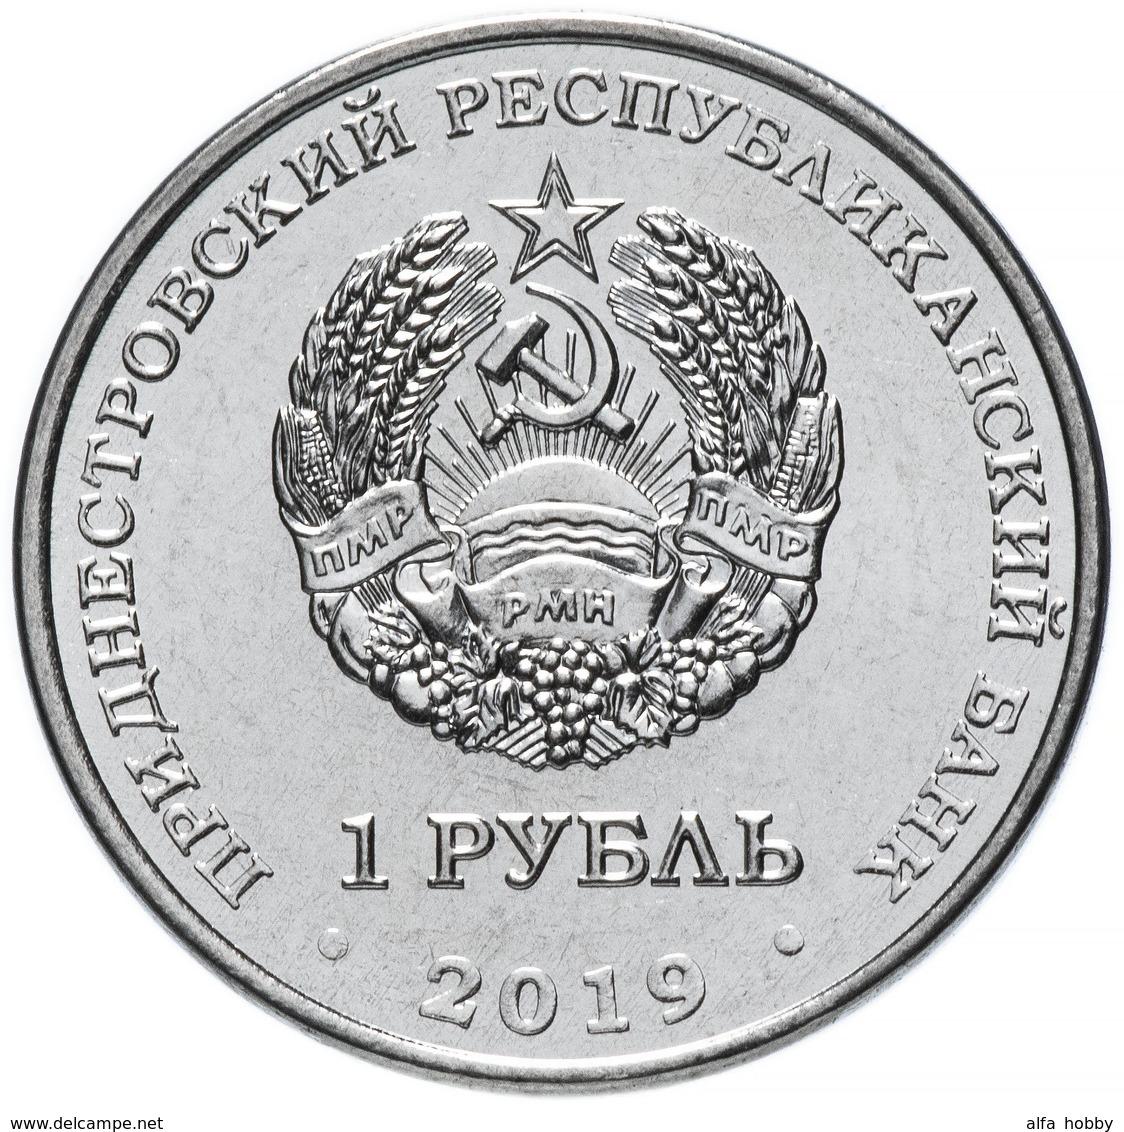 PMR Transnistrija, 2019, Space, Sputnik Luna -1,  1 Rbl Rubel - Russland